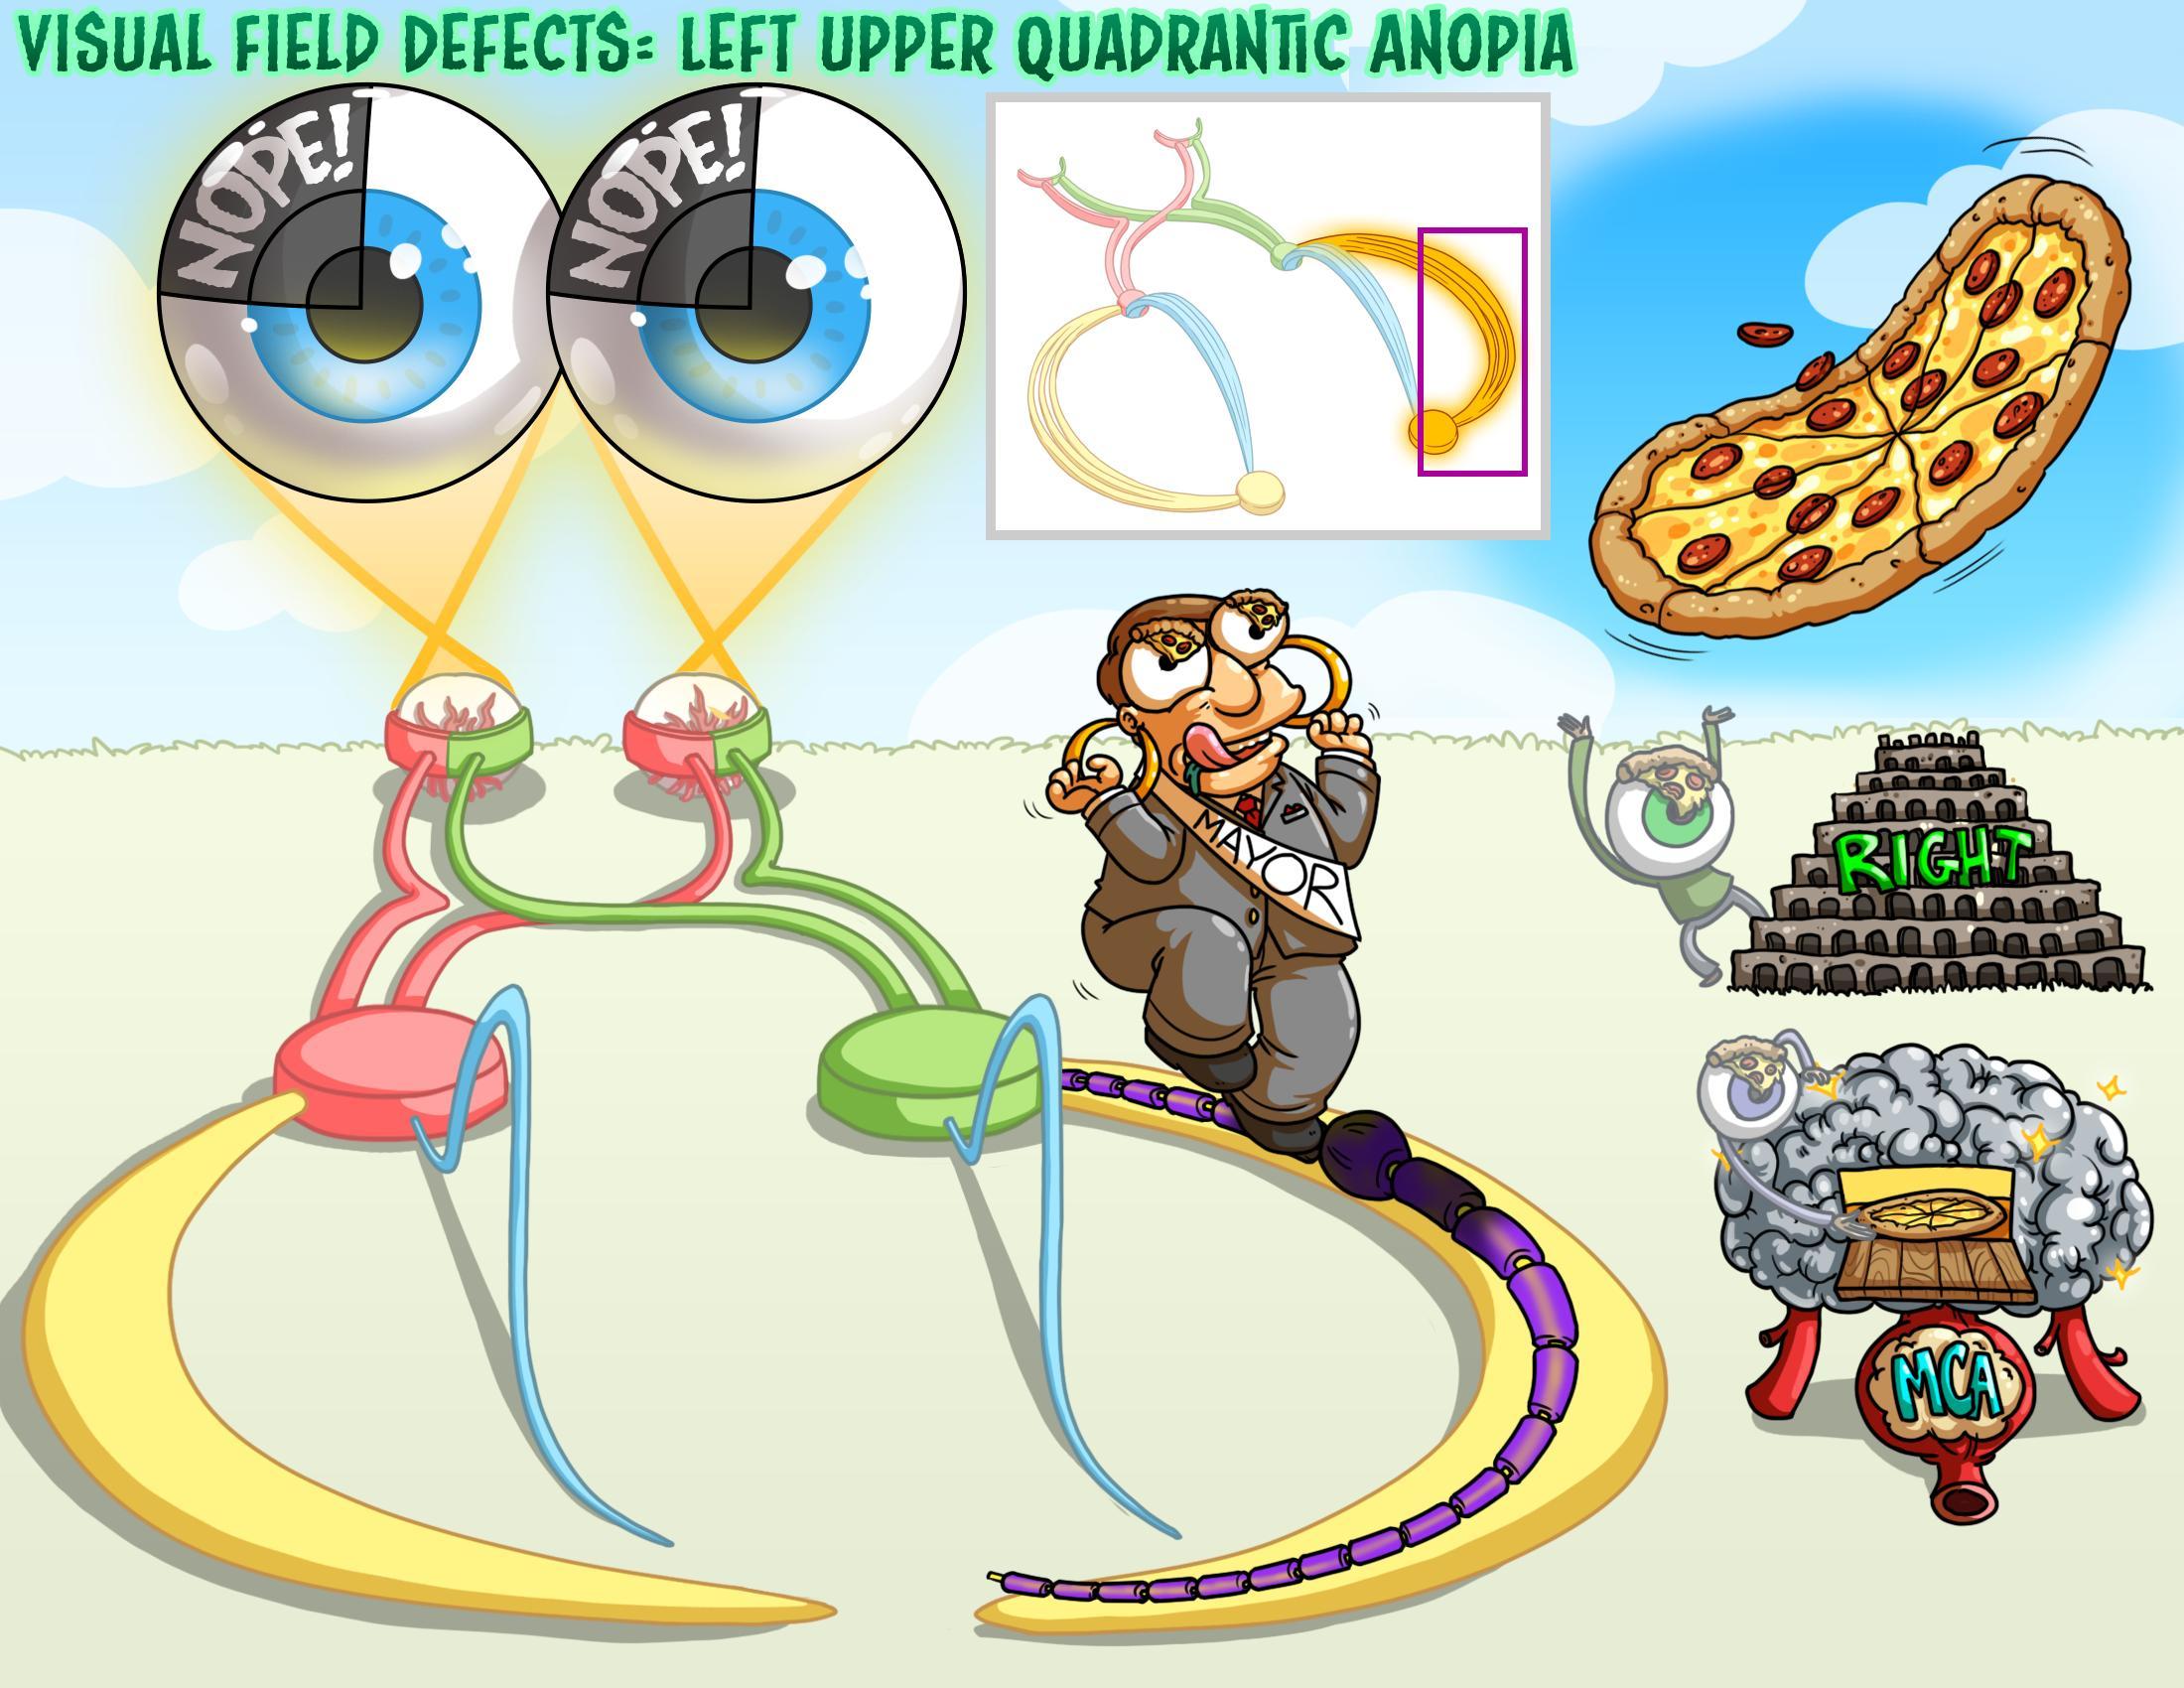 Visual Field Defects - Left Upper Quadrantic Anopia